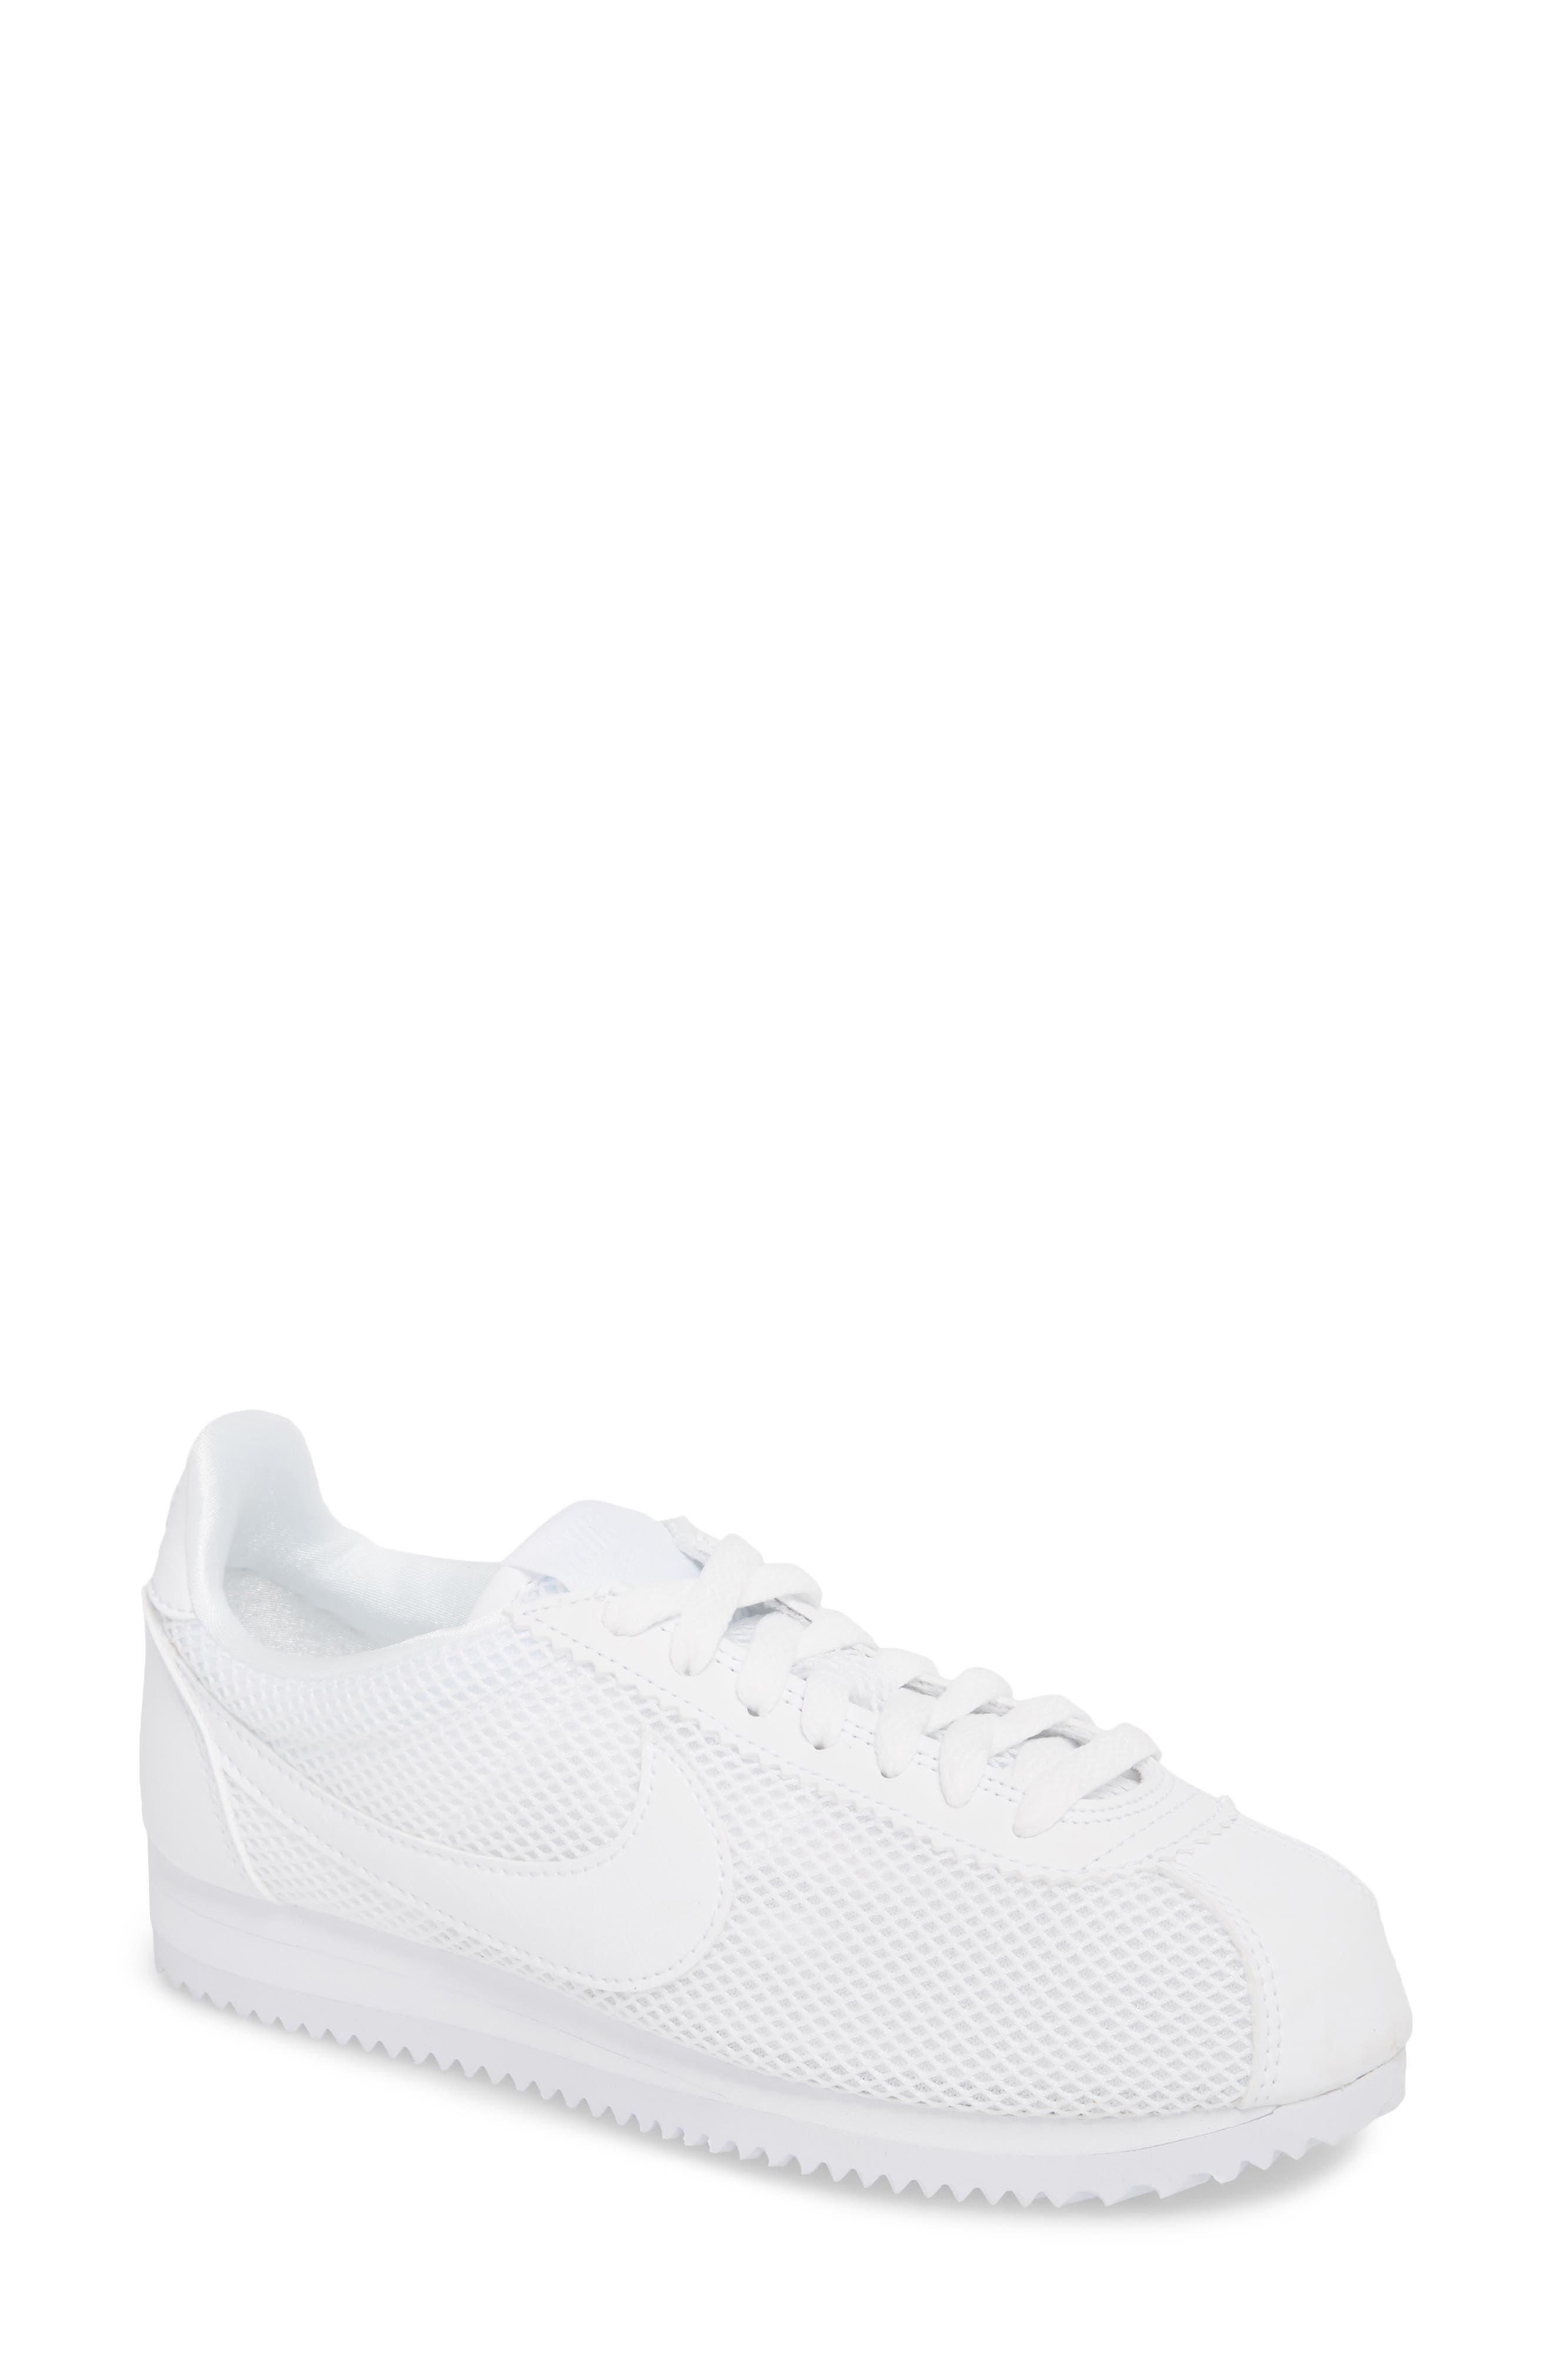 Classic Cortez Premium XLV Sneaker,                             Main thumbnail 1, color,                             White/ White